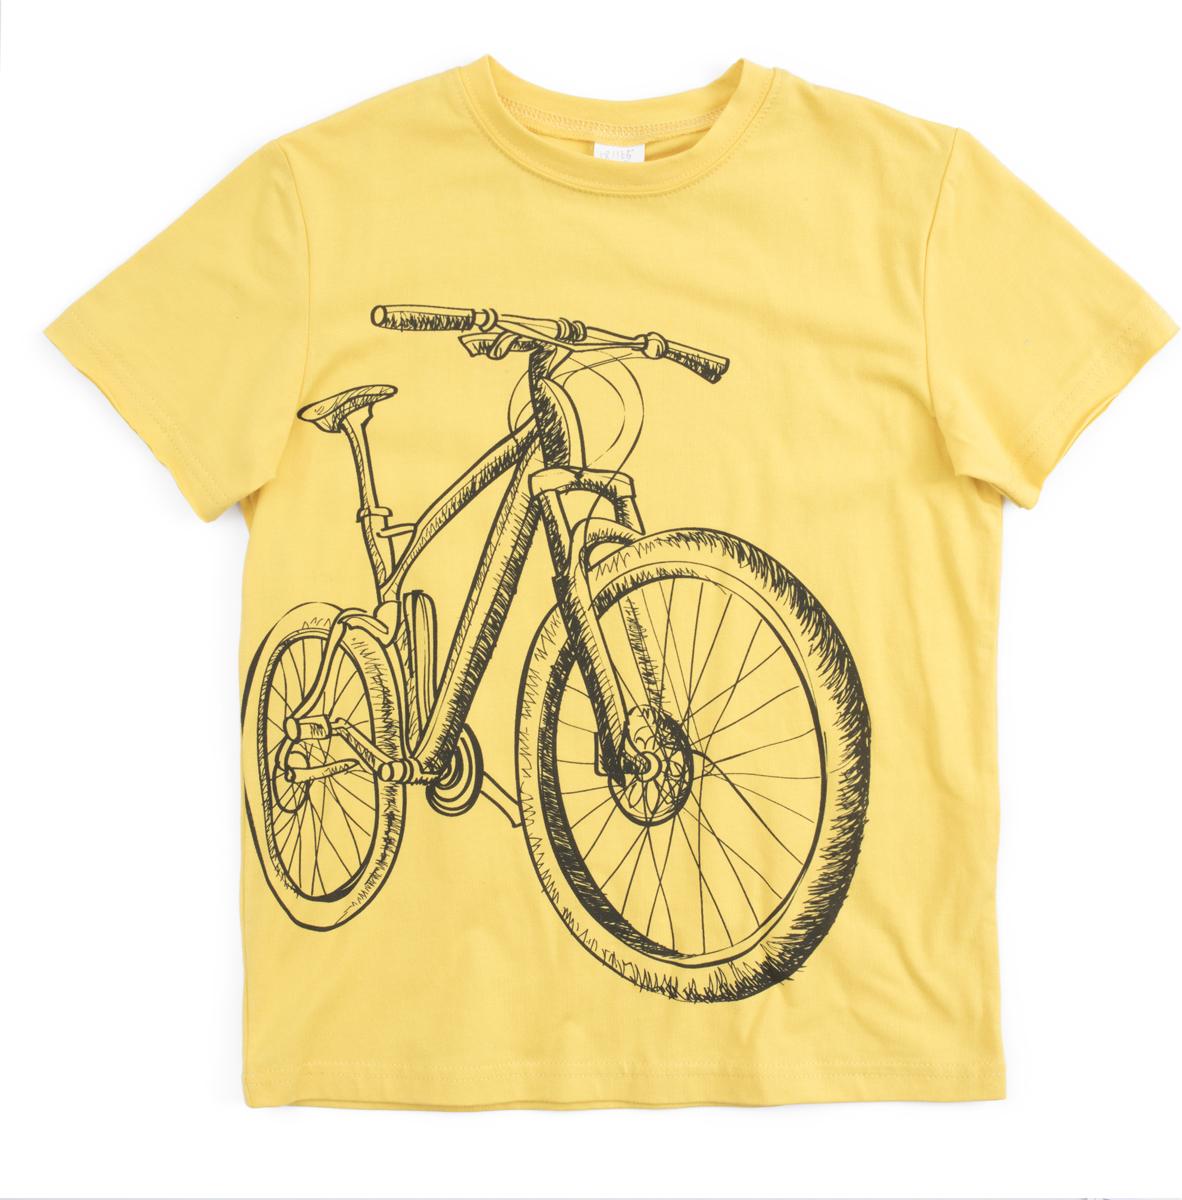 Футболка для мальчика PlayToday, цвет: желтый, темно-серый. 181165. Размер 122 футболка для мальчика mitre цвет желтый t70002ylb размер 122